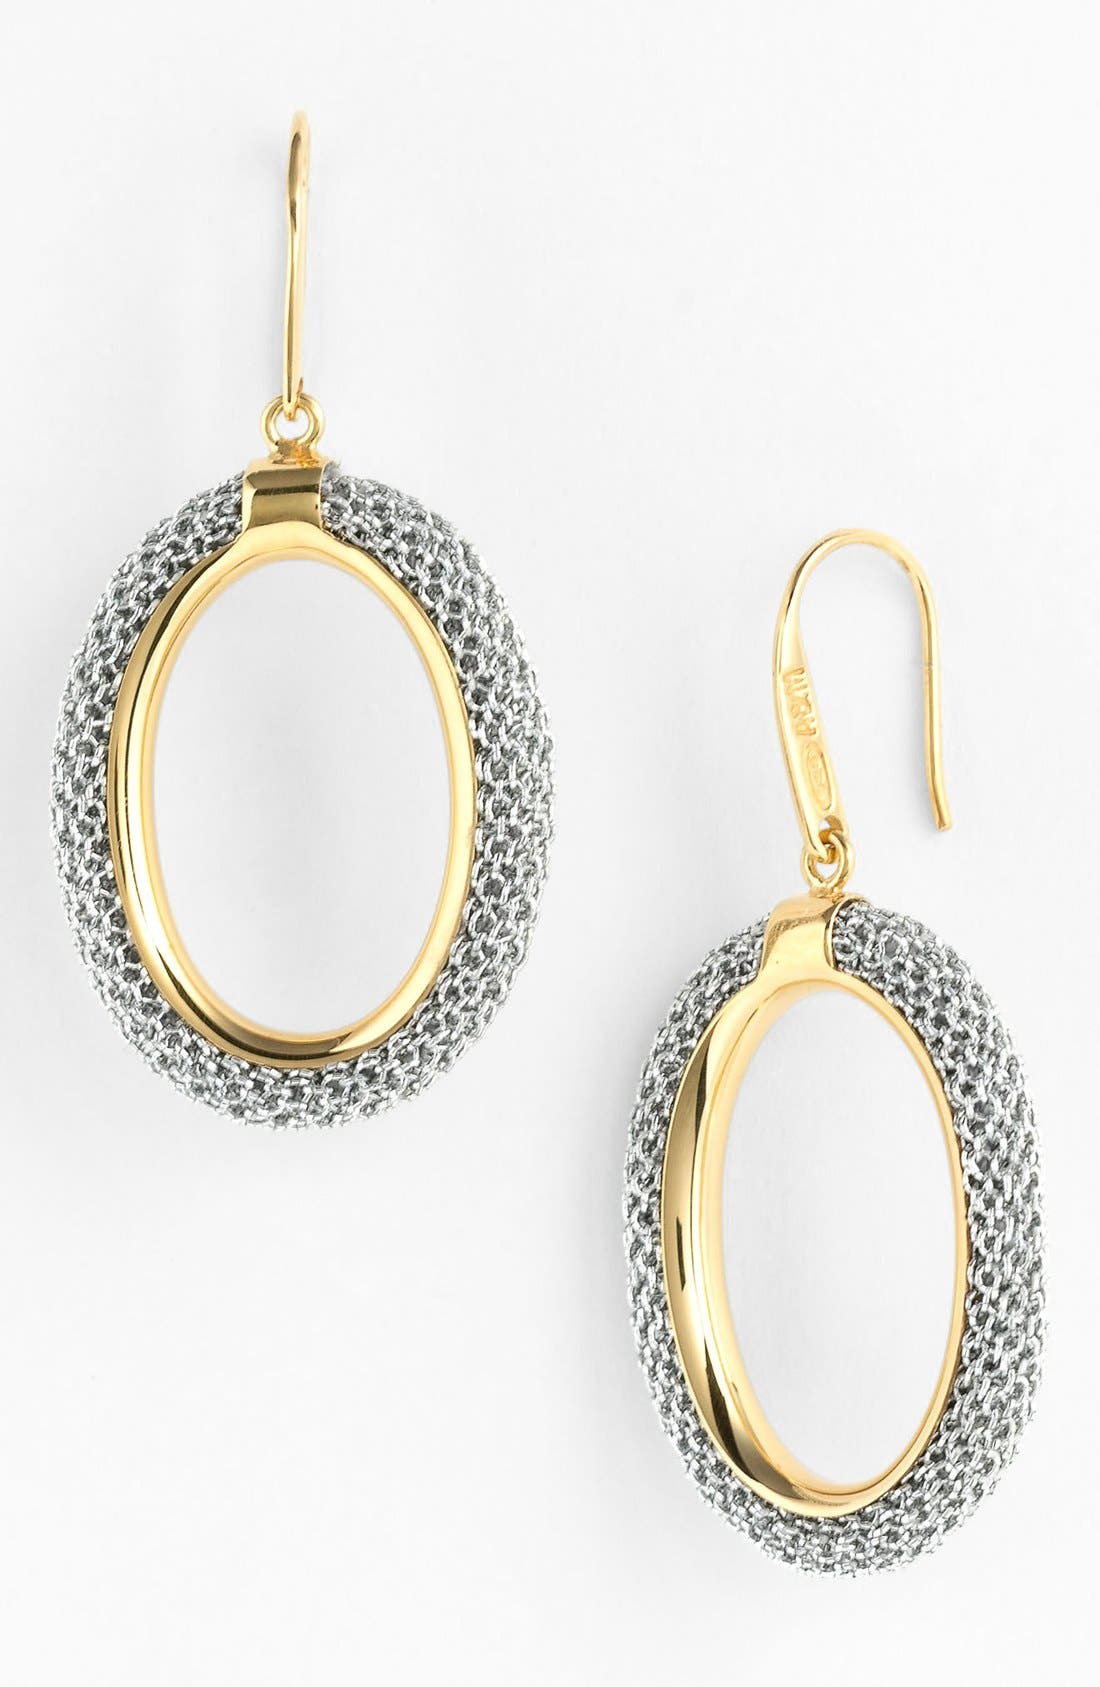 Alternate Image 1 Selected - Adami & Martucci 'Mesh' Oval Drop Earrings (Nordstrom Exclusive)